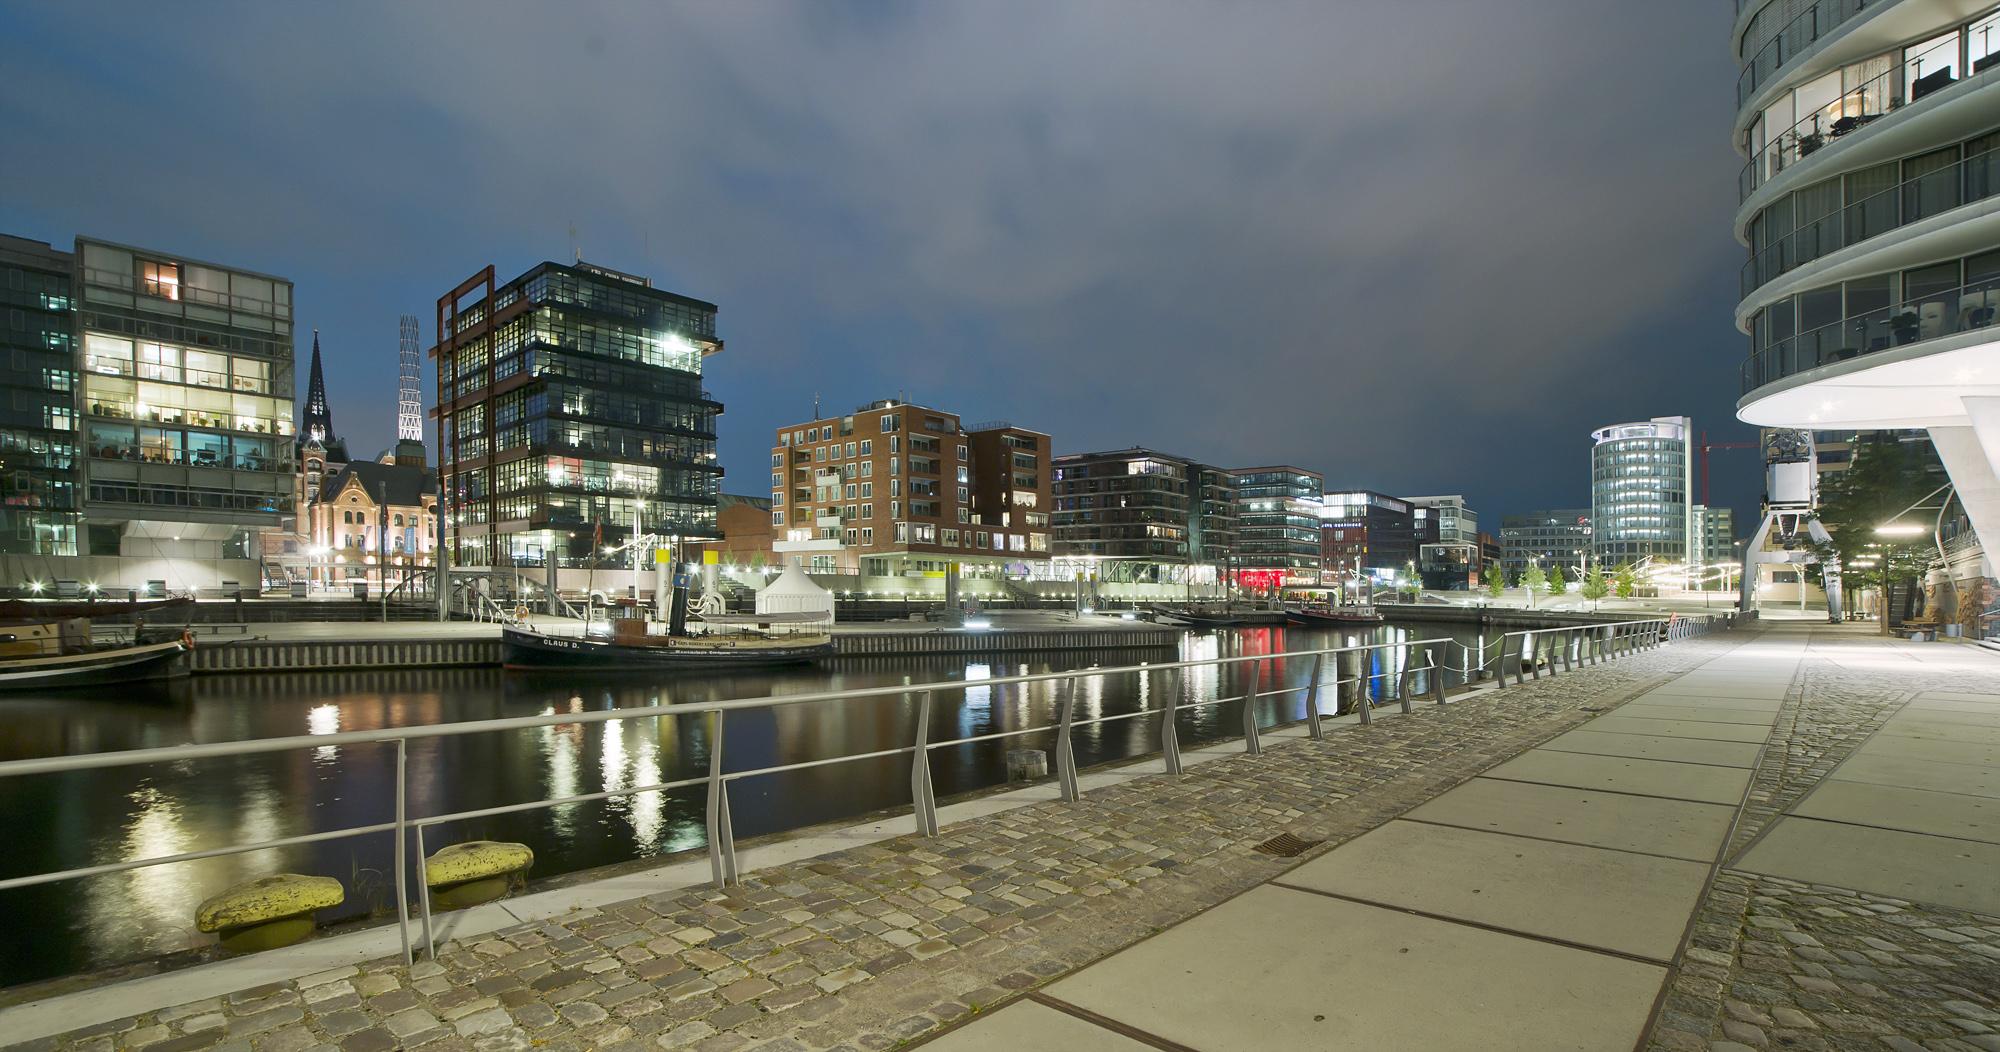 Hafencity, Sandtorkai, Hamburg